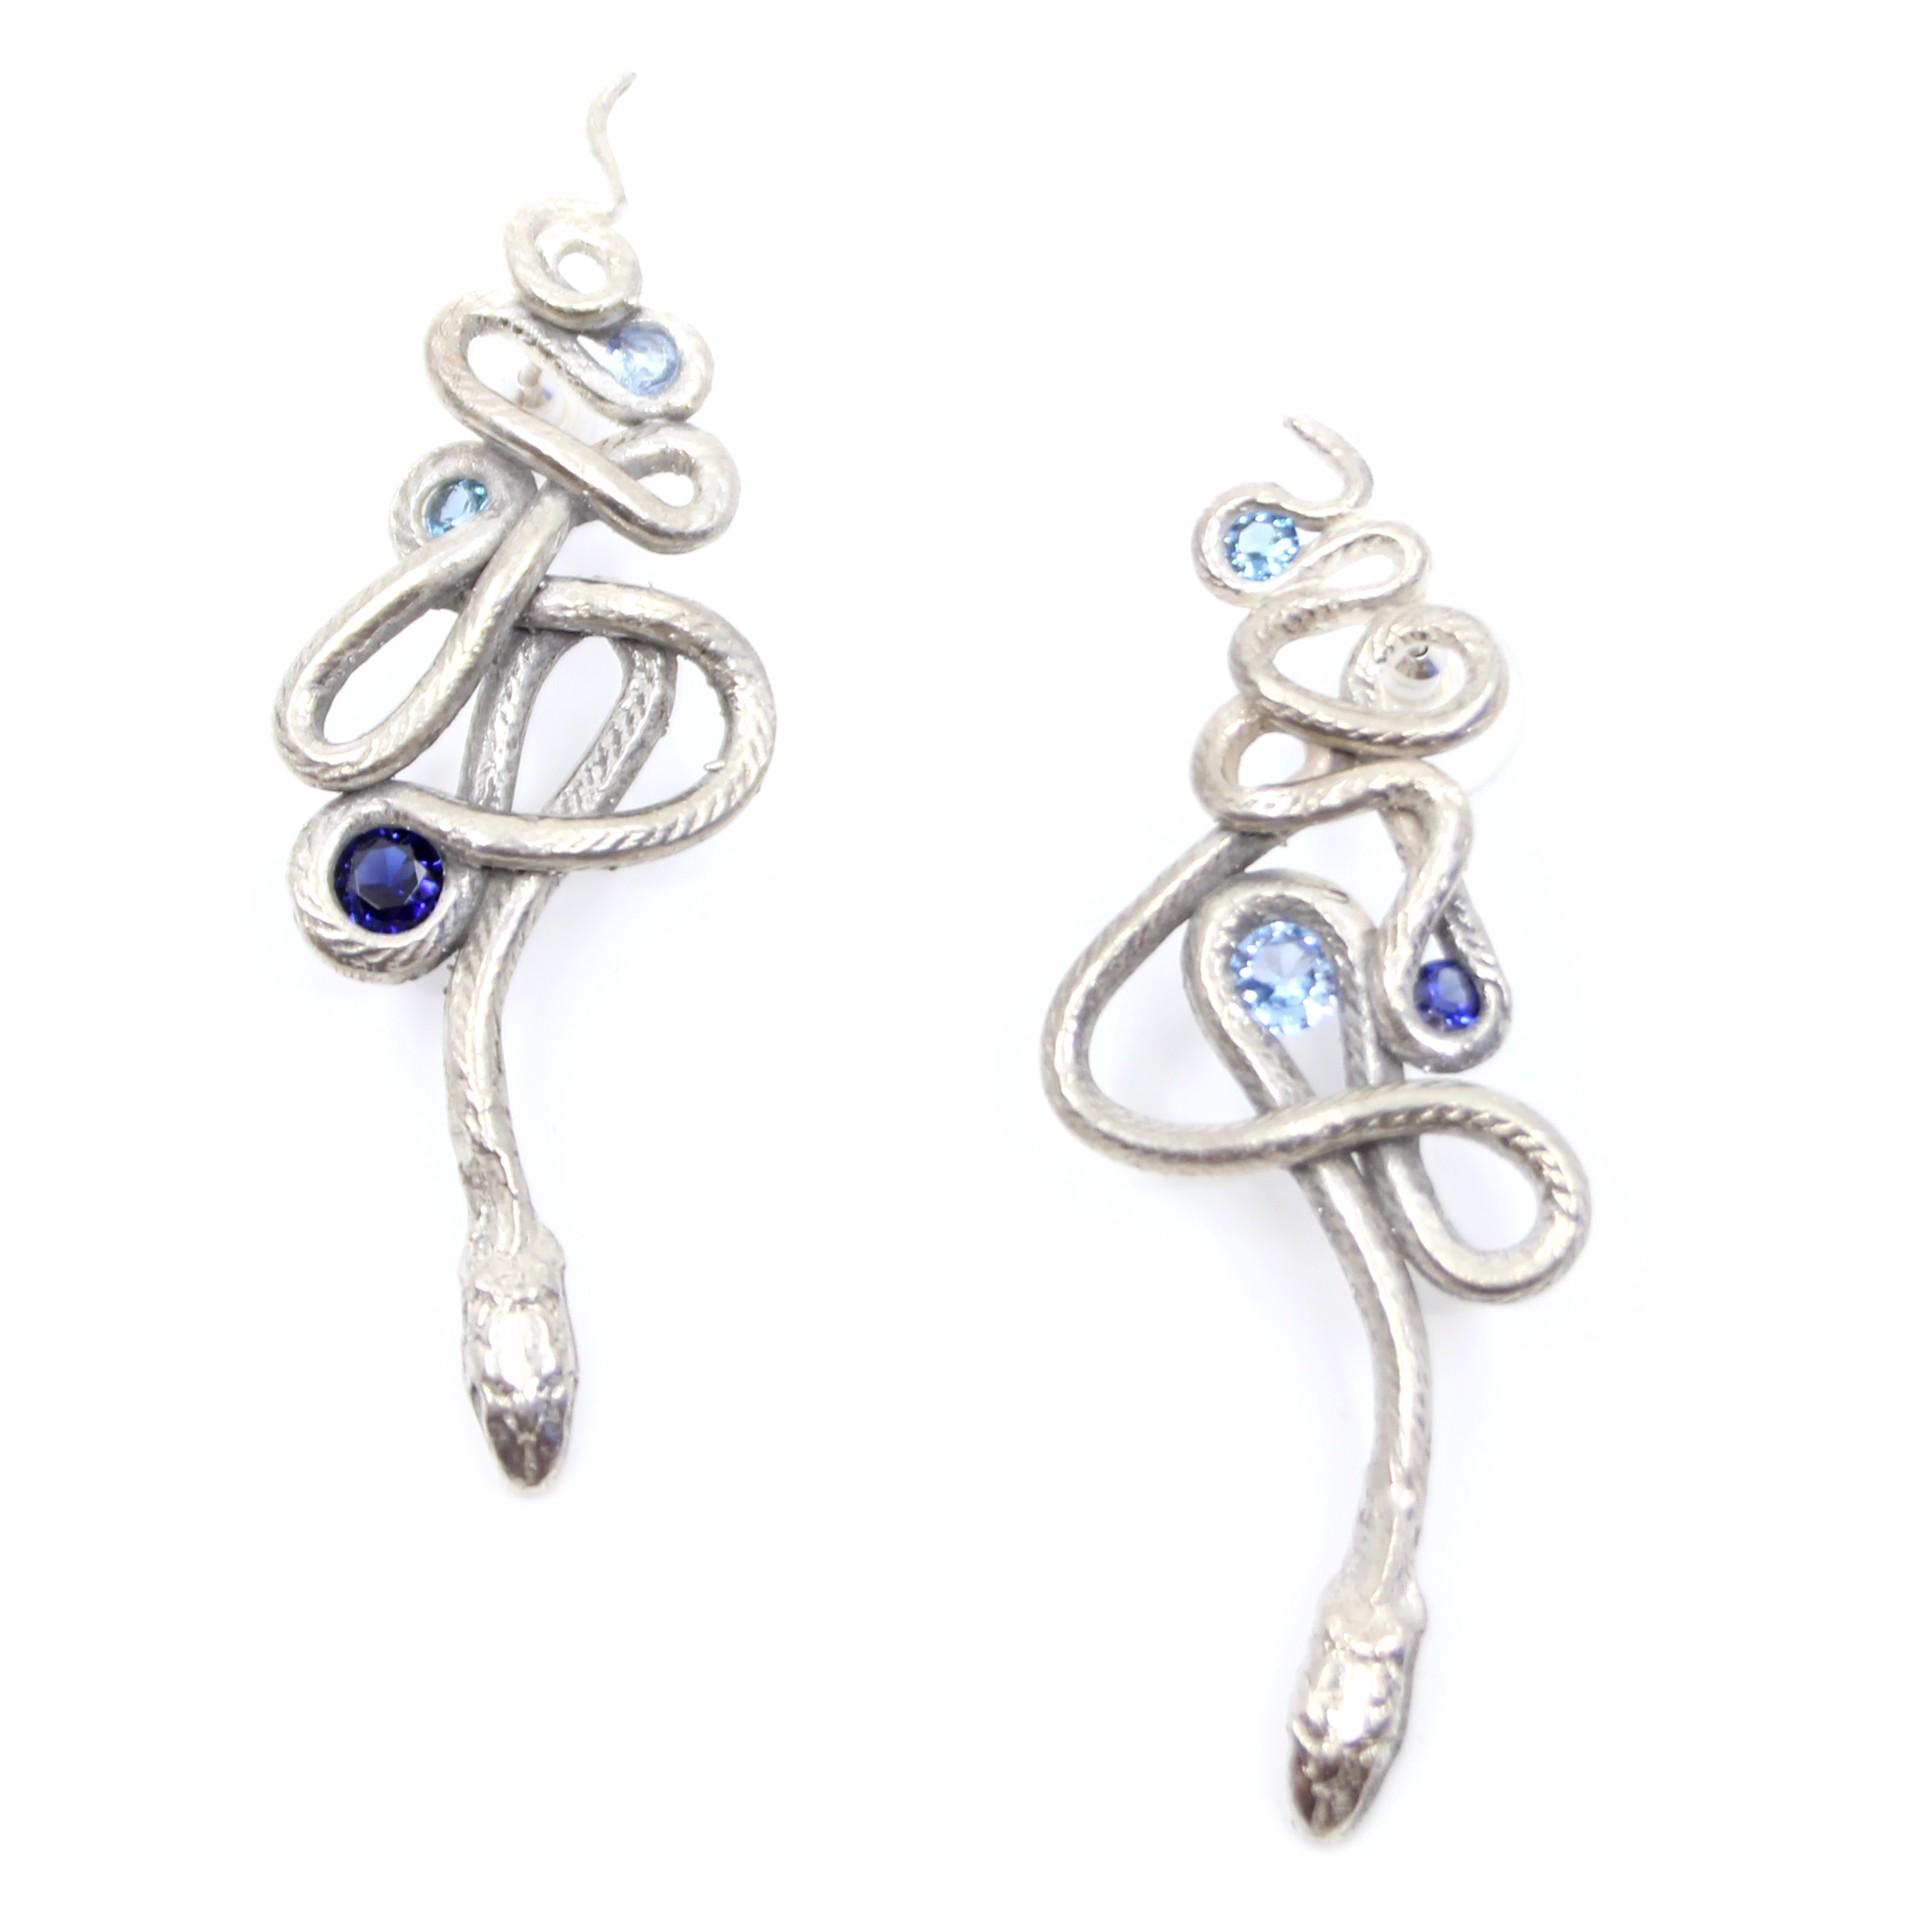 Sapphire Serpentine Earrings by Anna Johnson